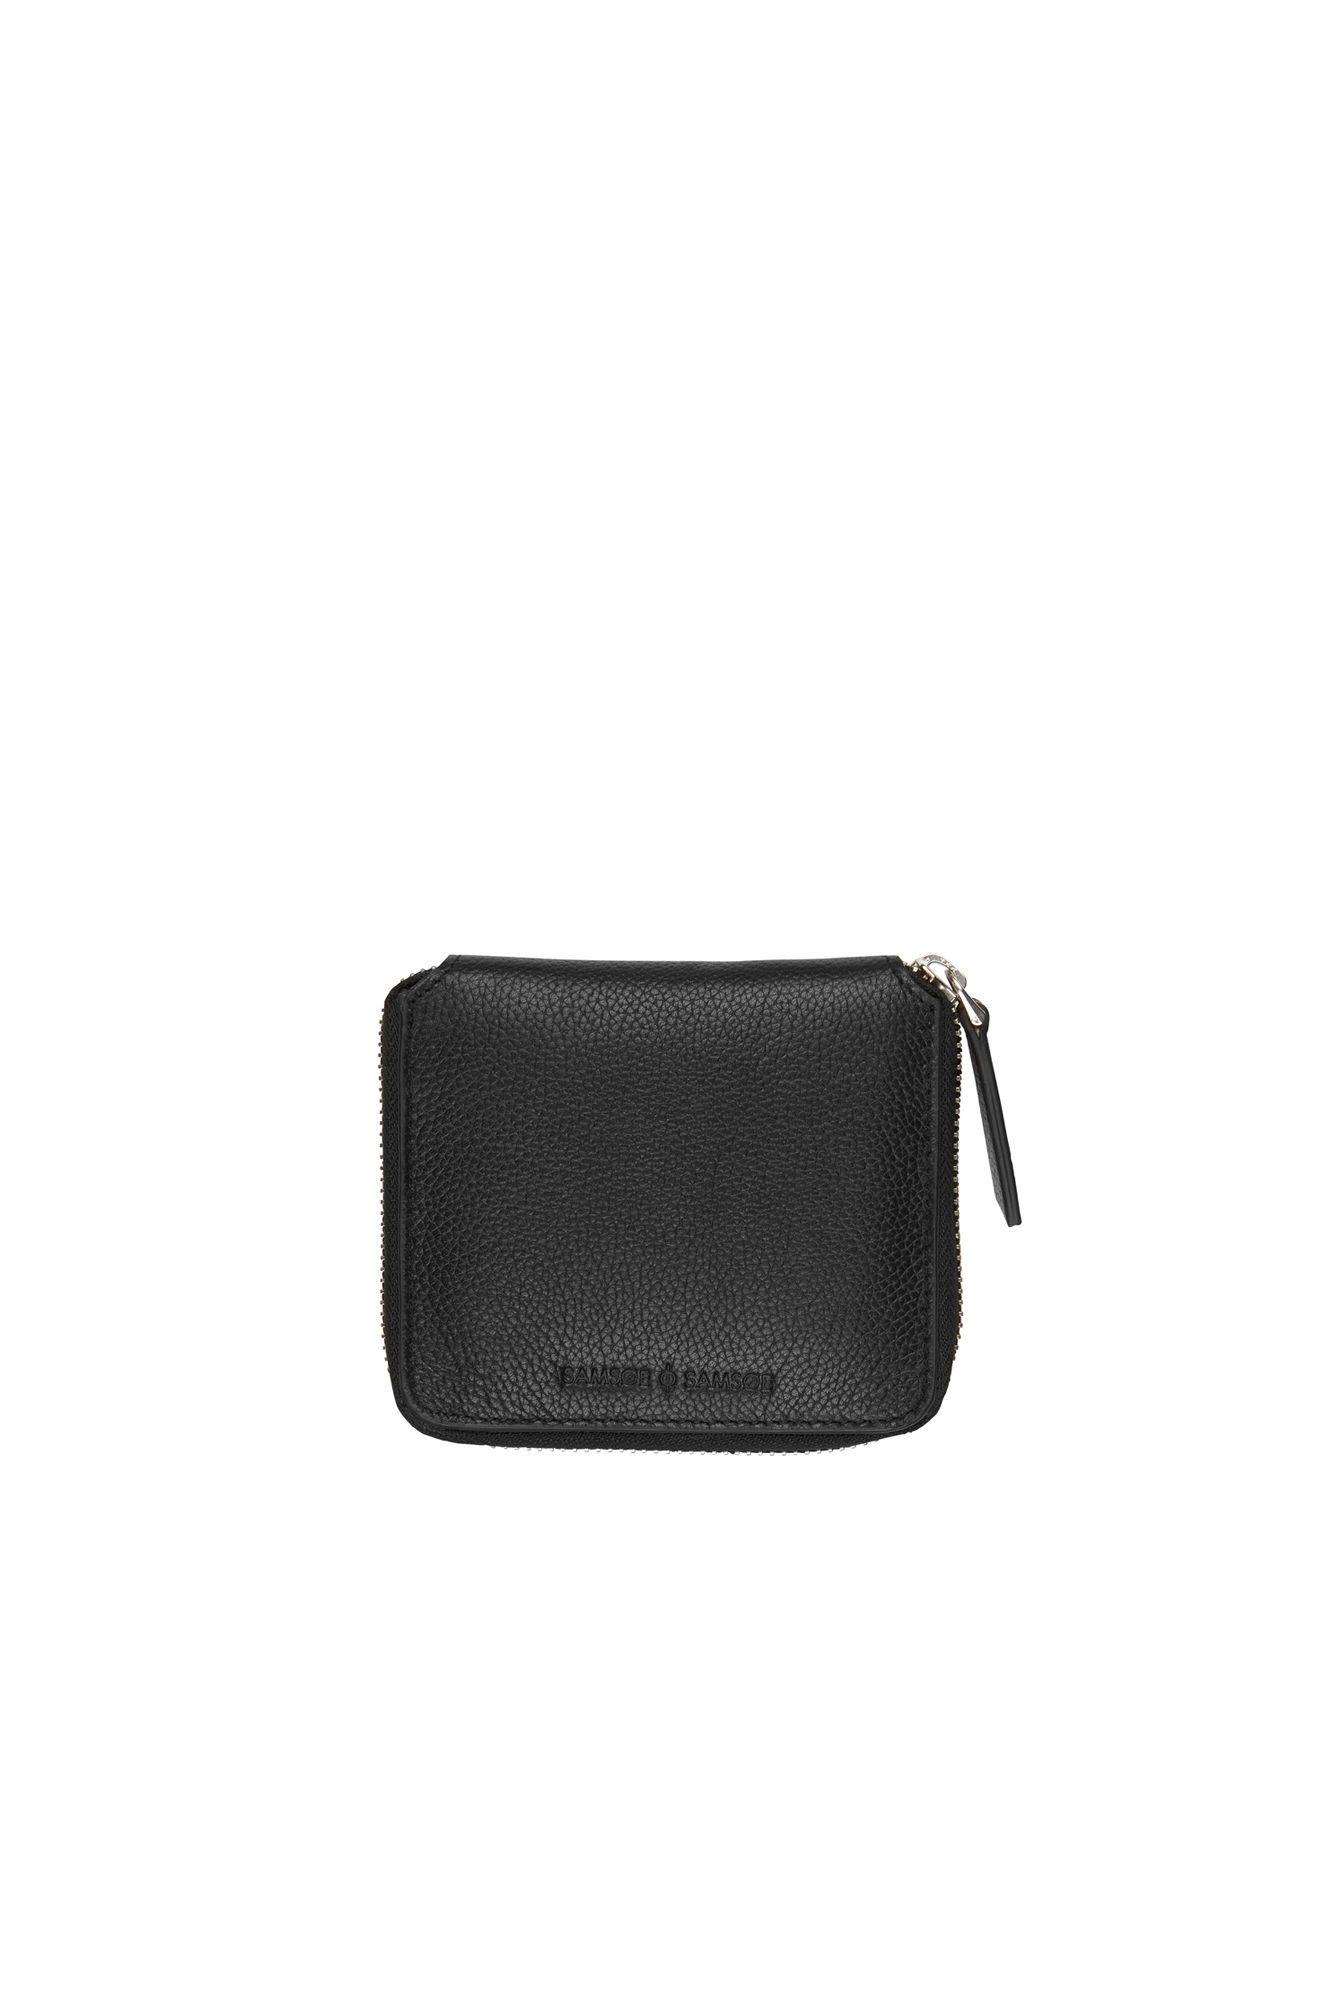 974b1a7e612 Mugg wallet w 3338, BLACK | Exterior | Wallet, Zip around wallet, Bags